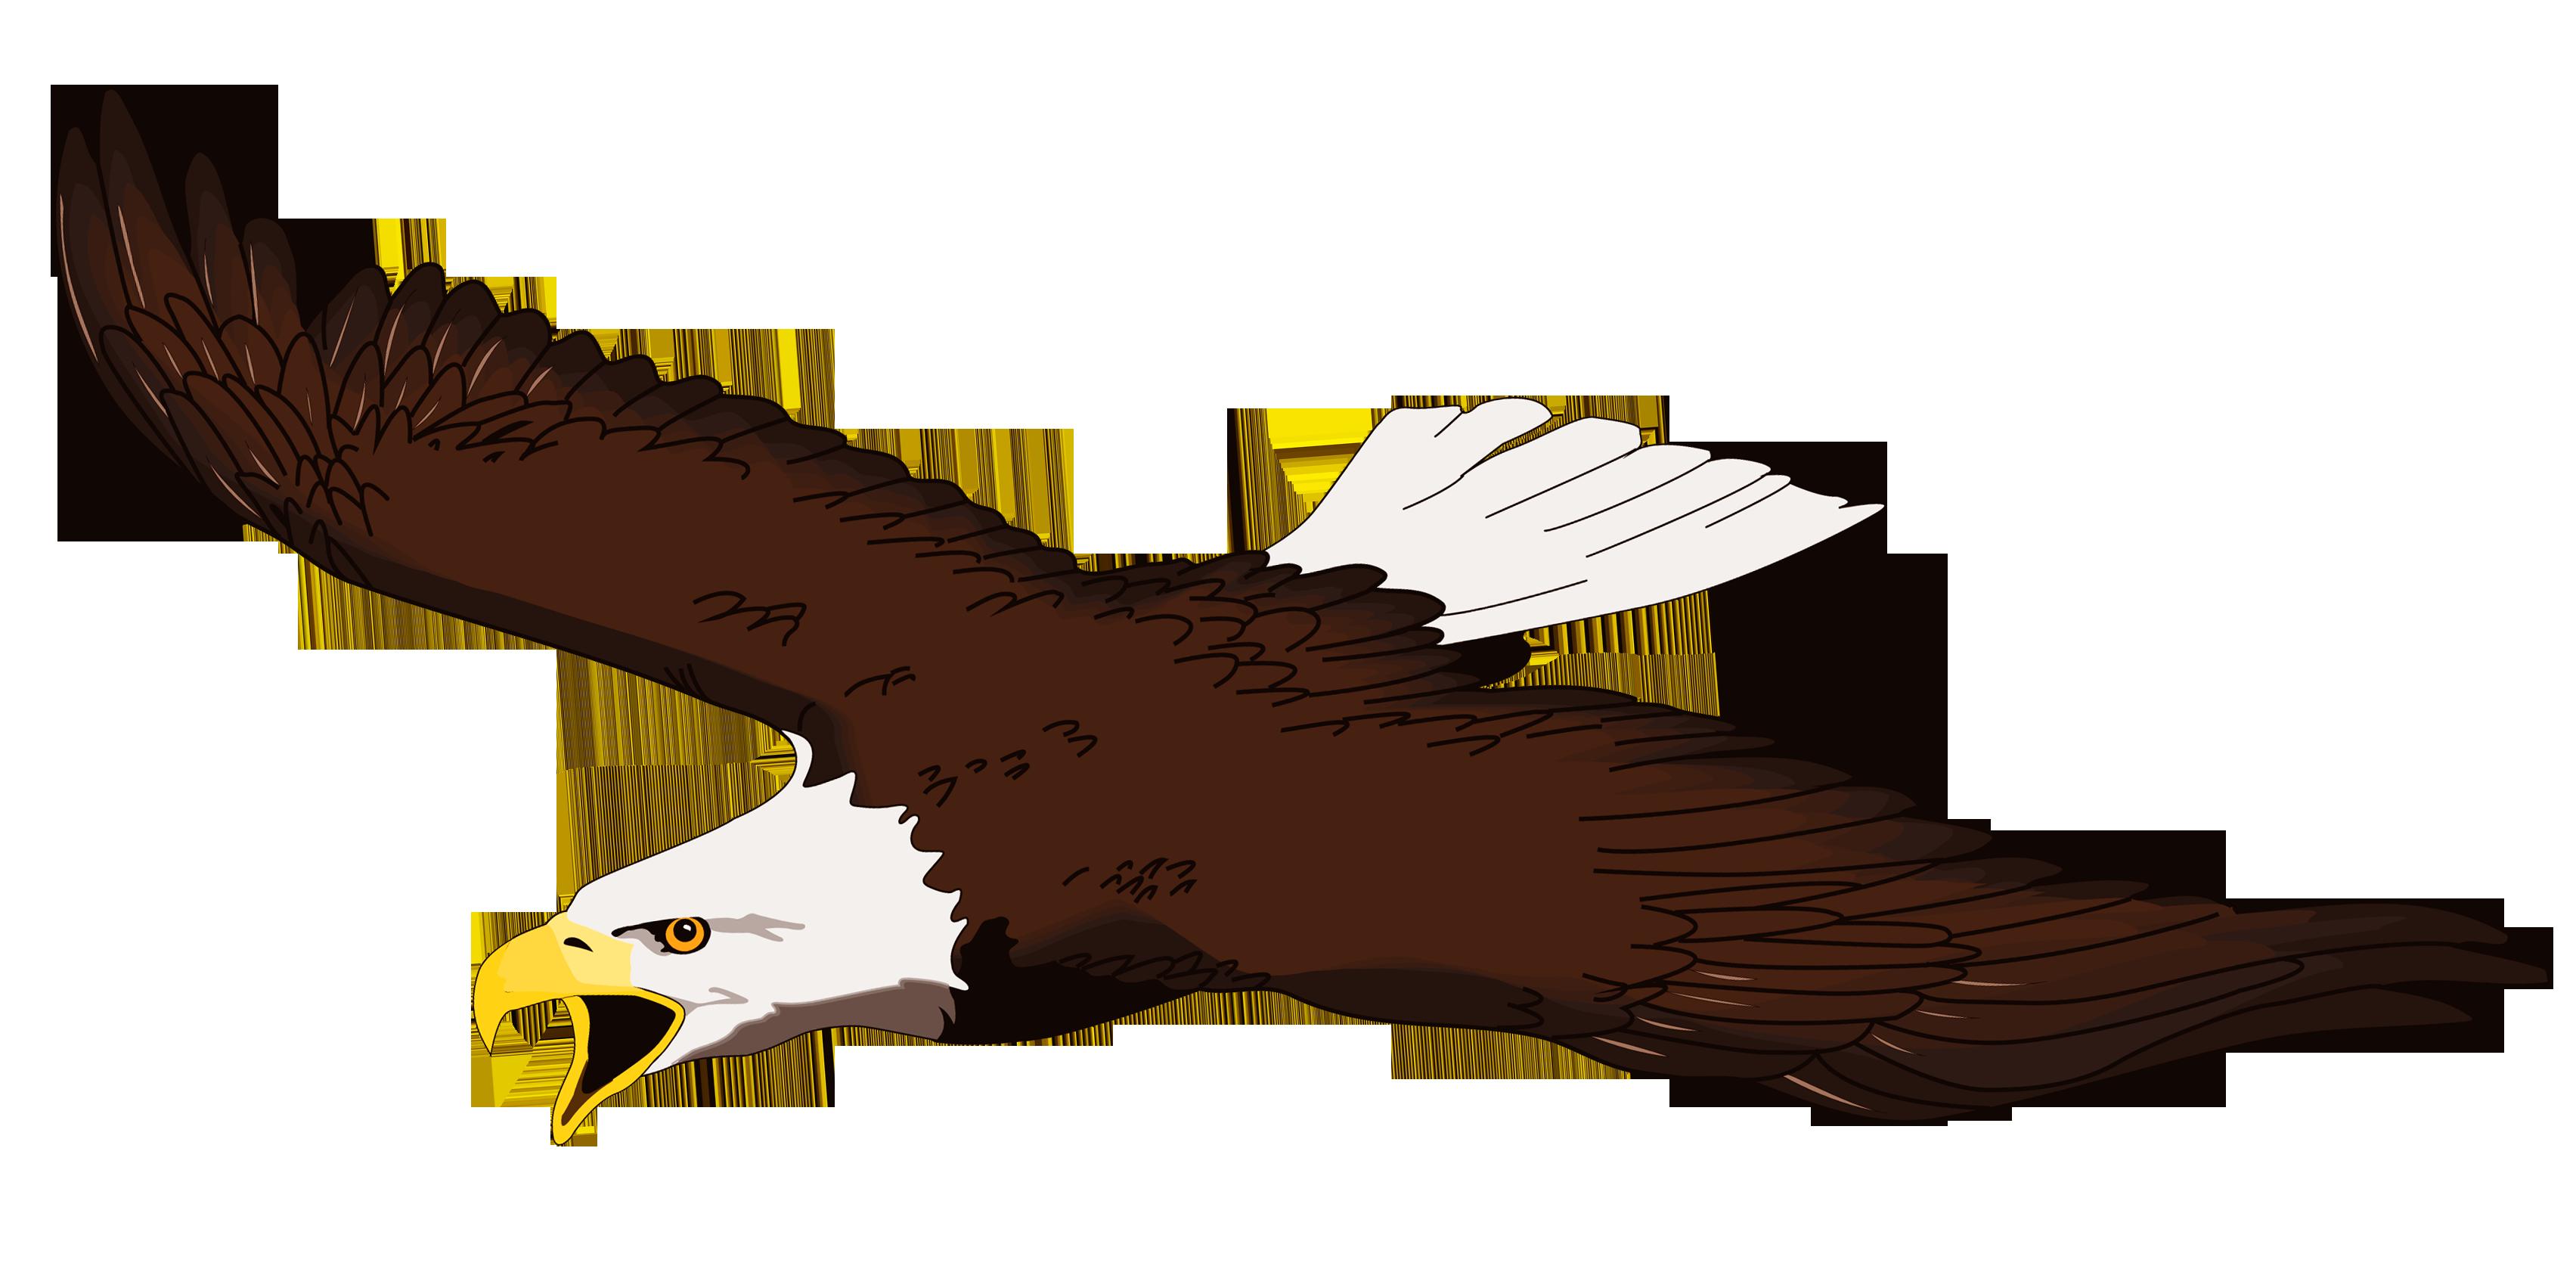 3407x1678 Best Eagle Clipart